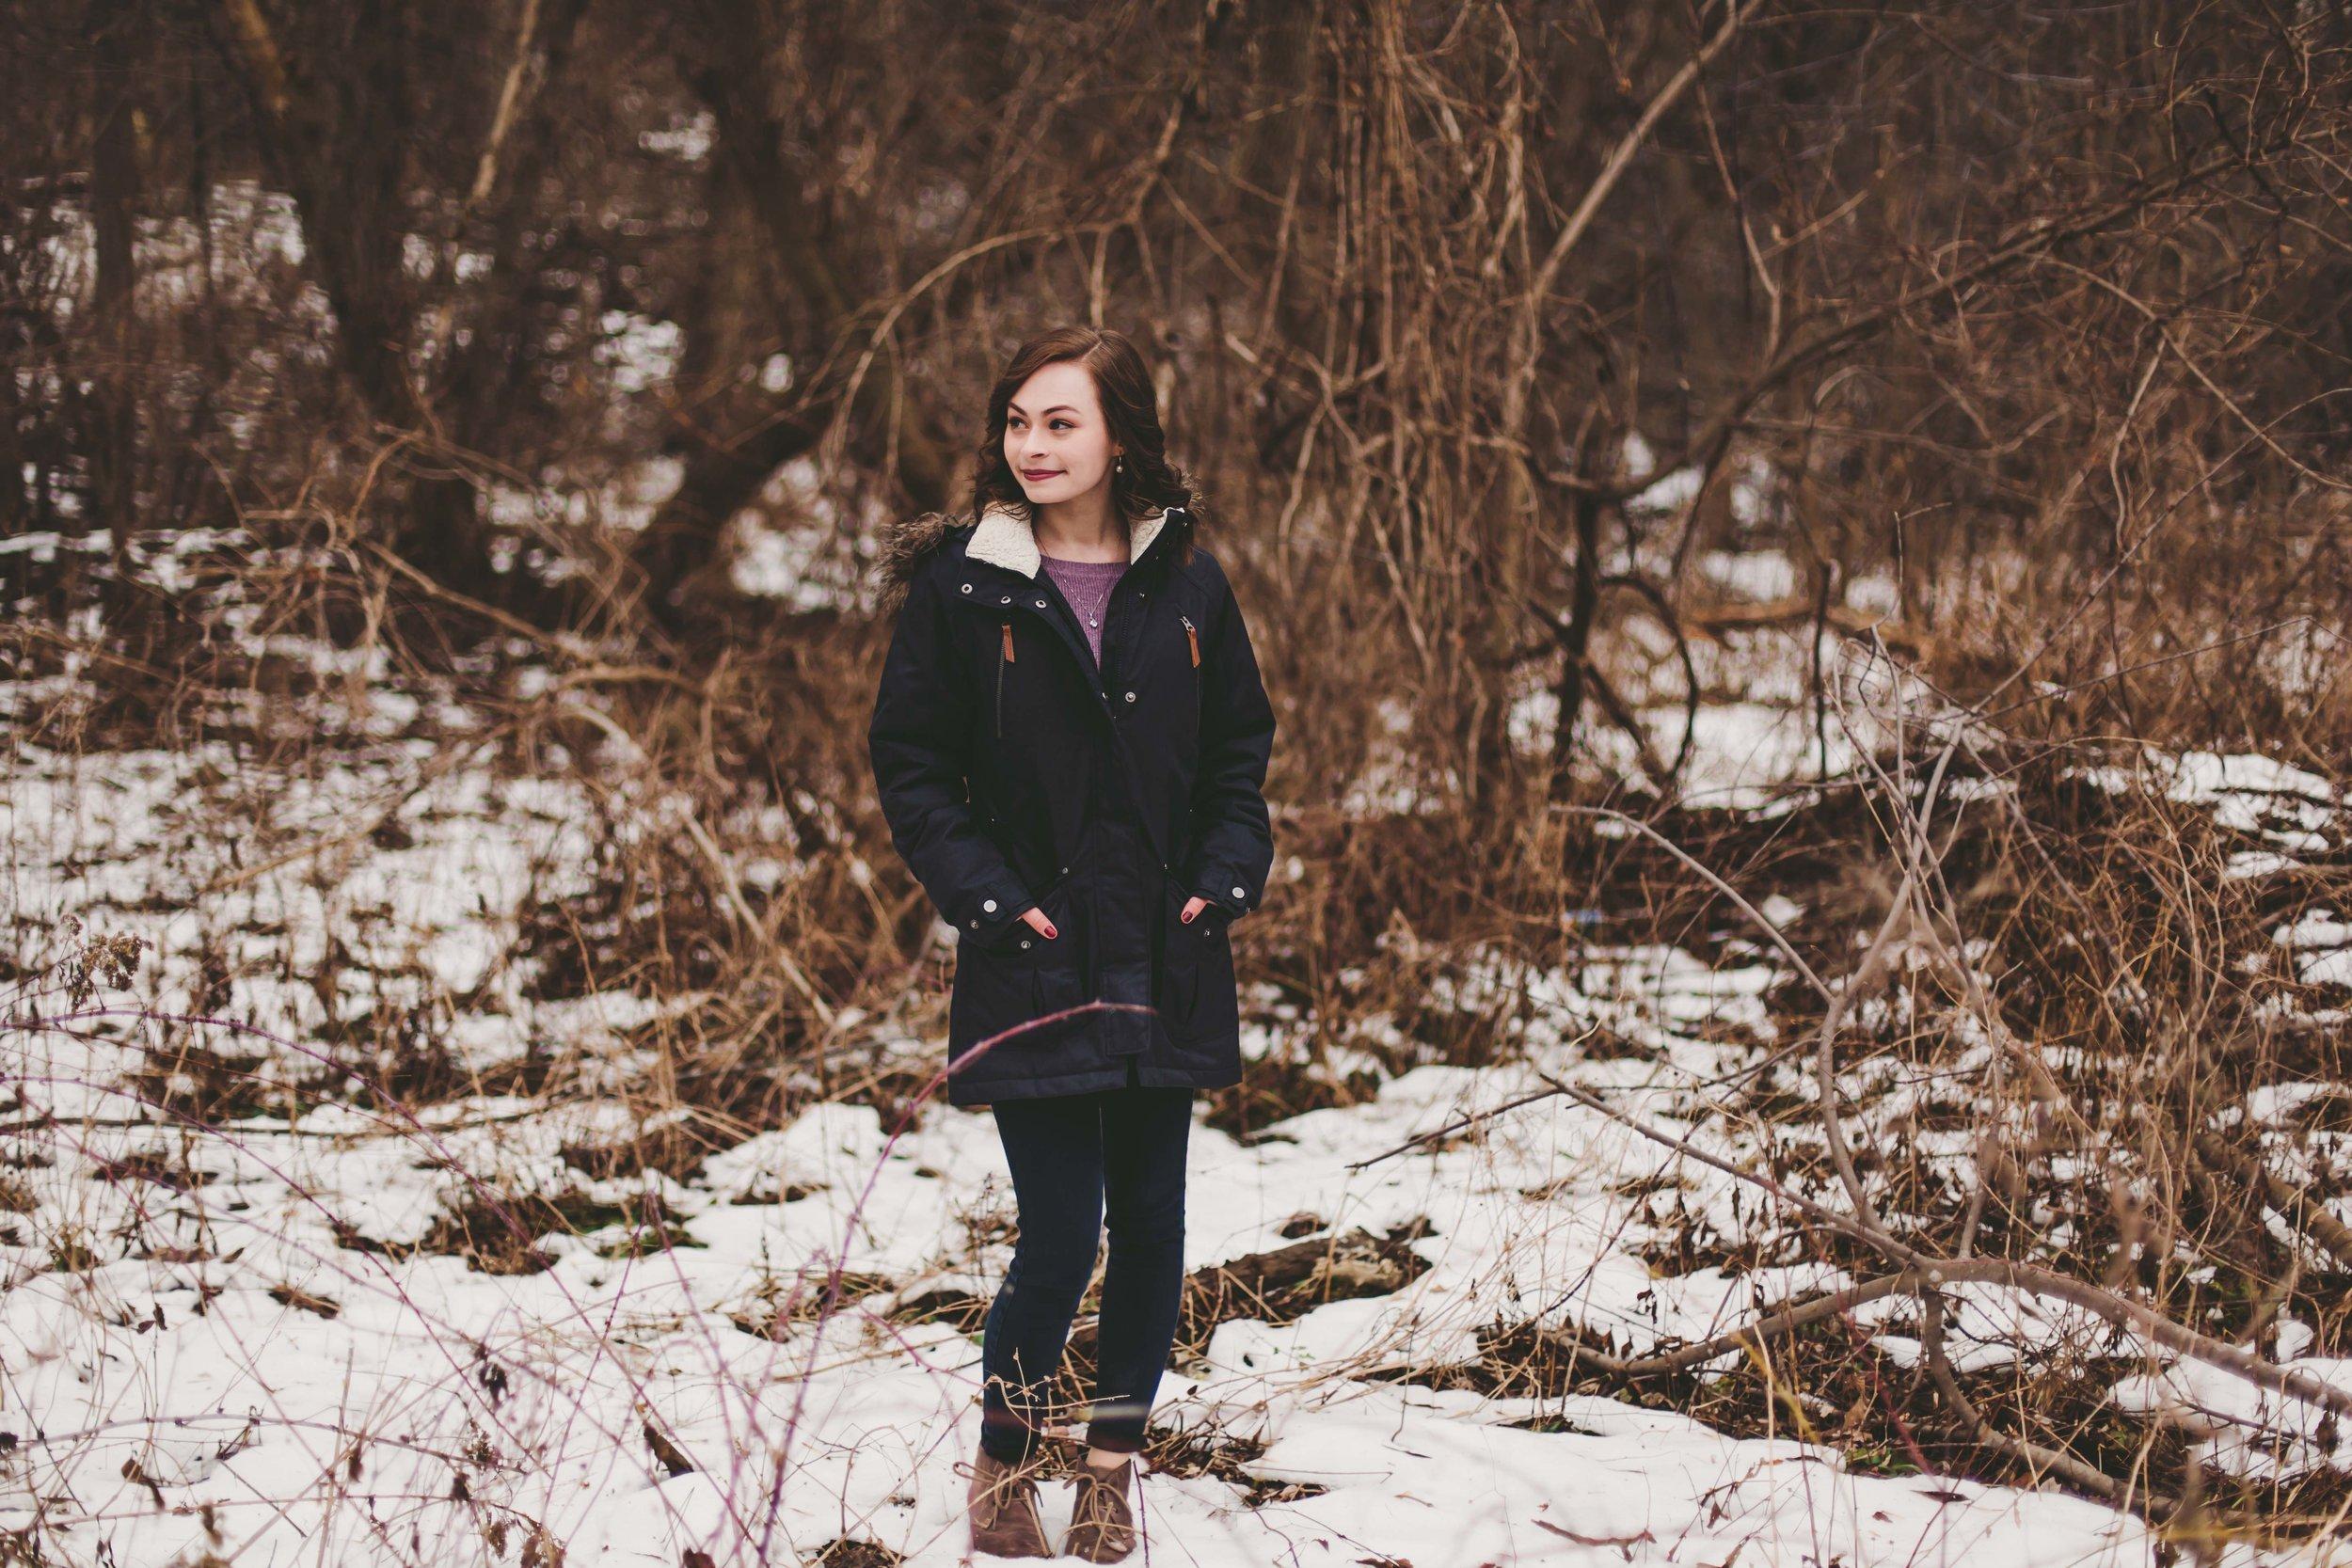 winter photoshoot in london england by Nashville Senior portrait Photographer Emily Anne Photography